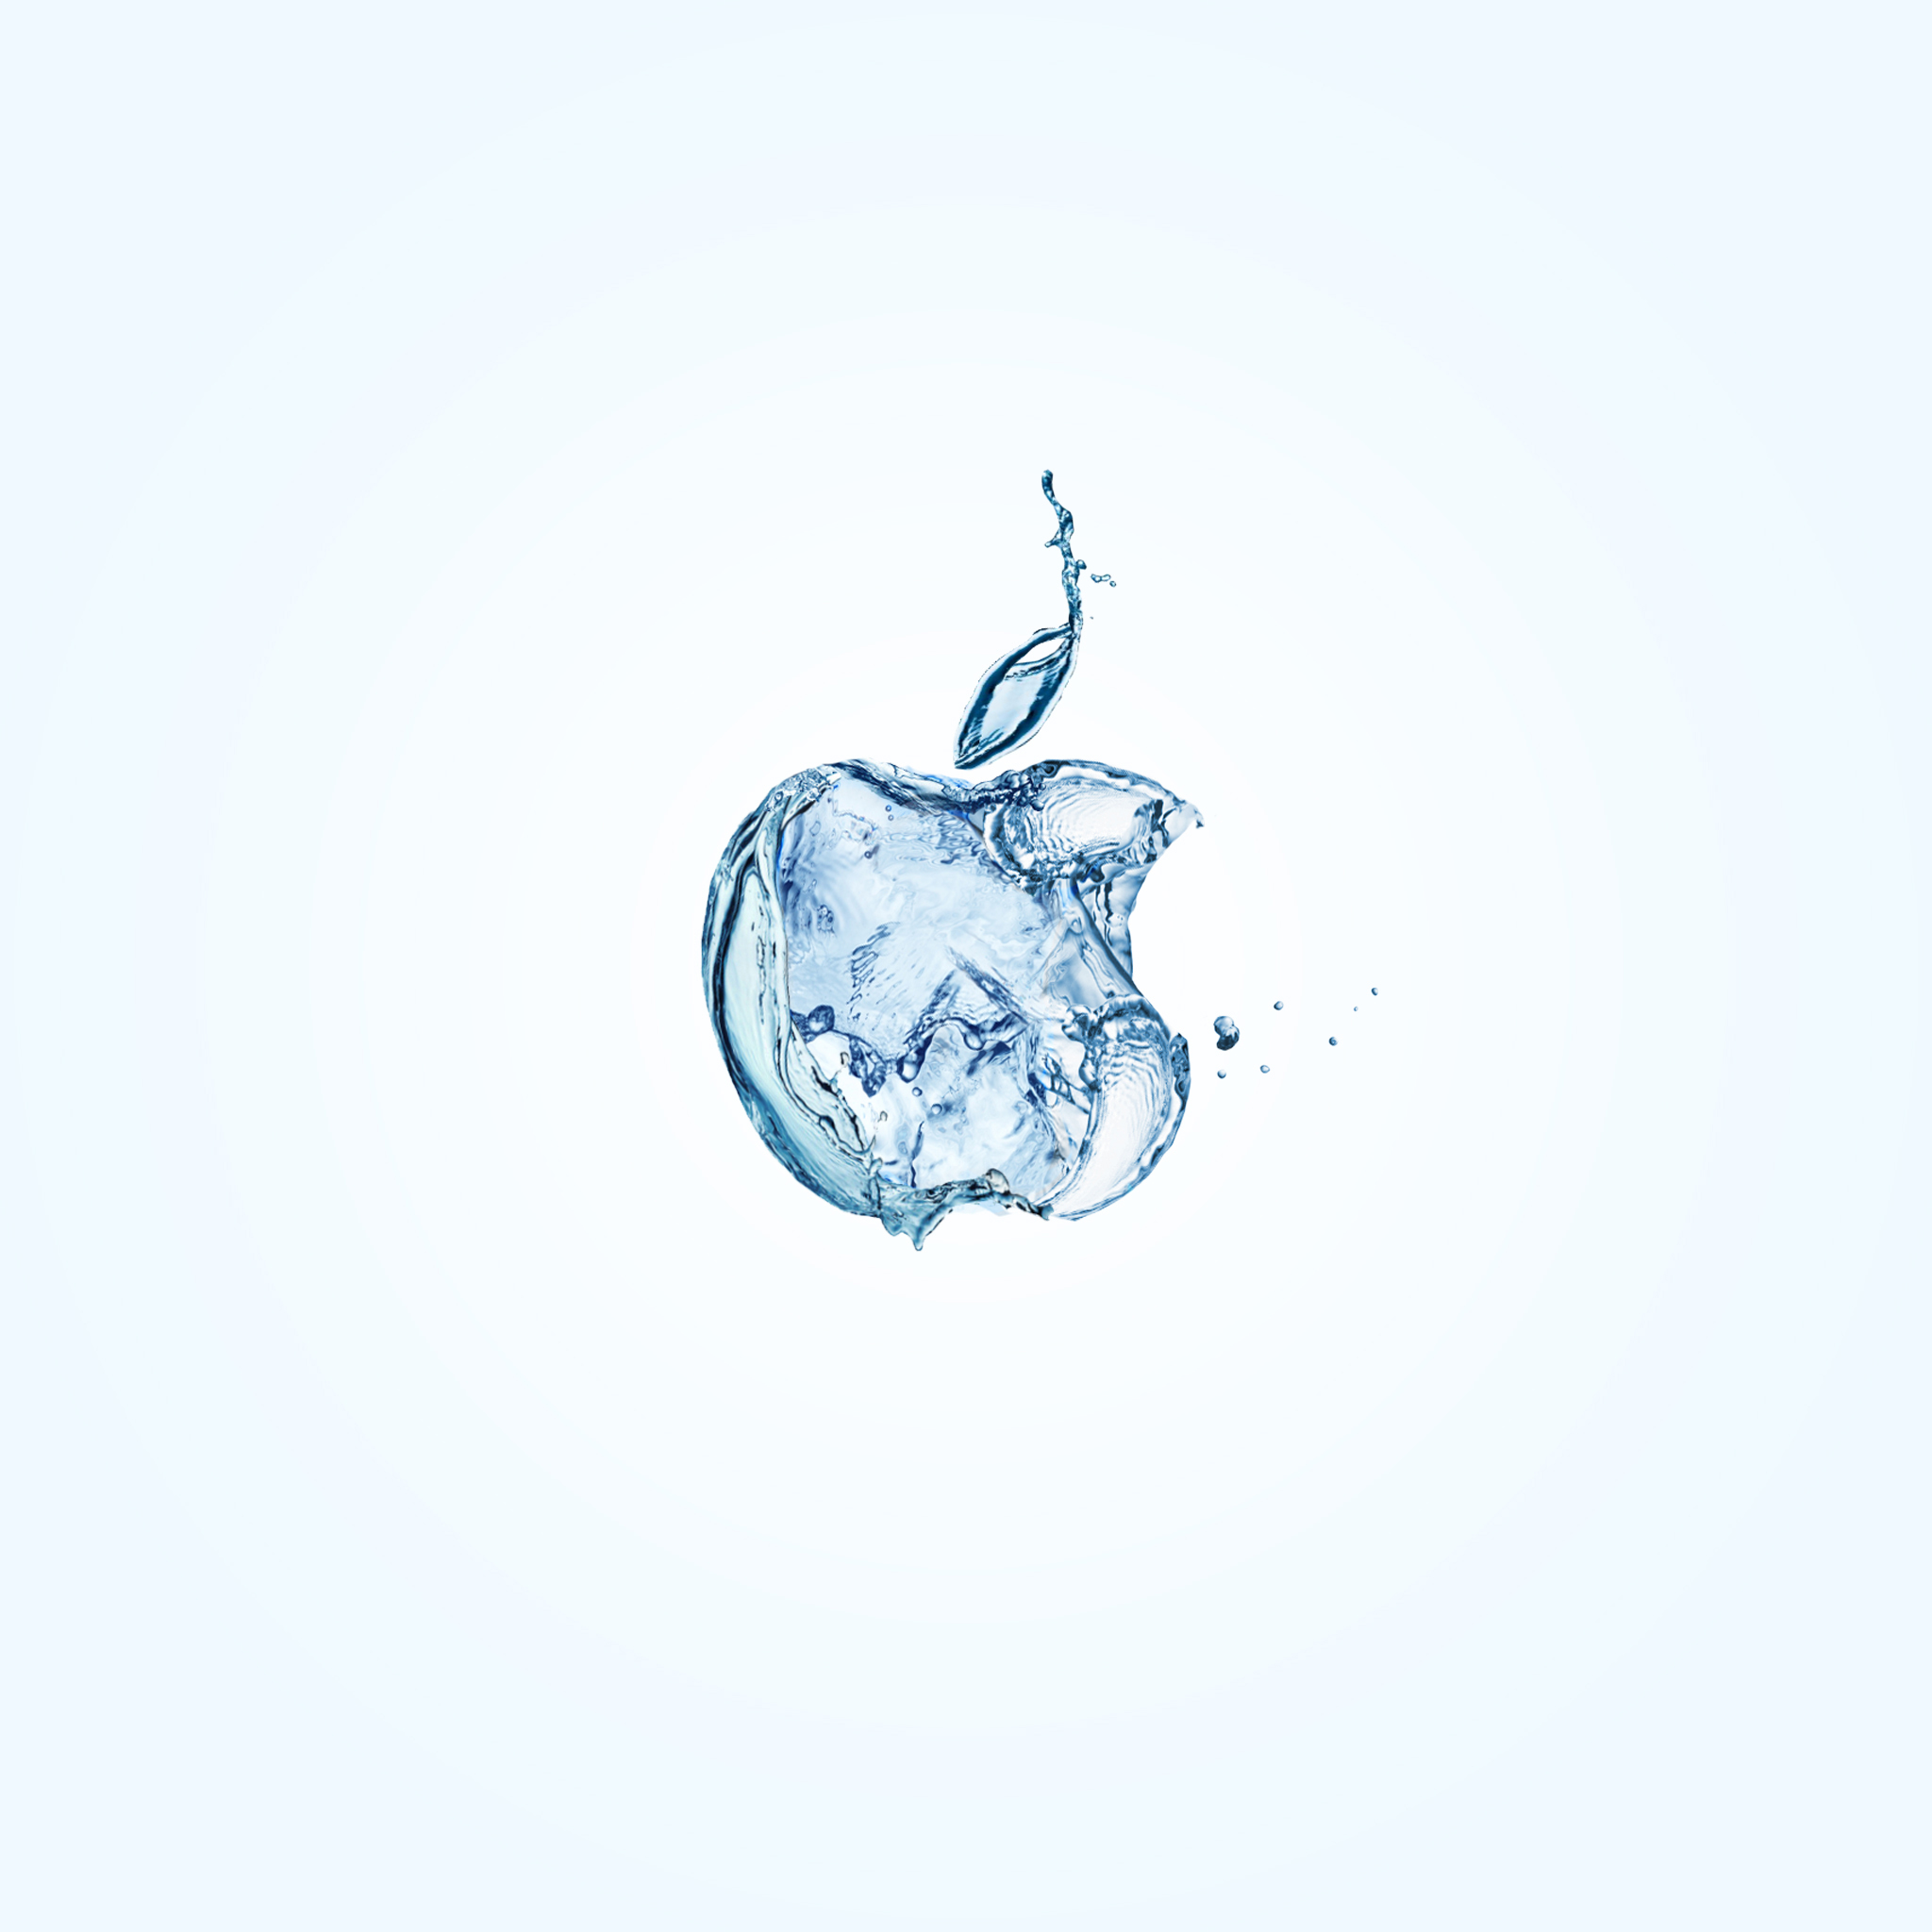 Water-Apple-3Wallpapers-iPad-Retina